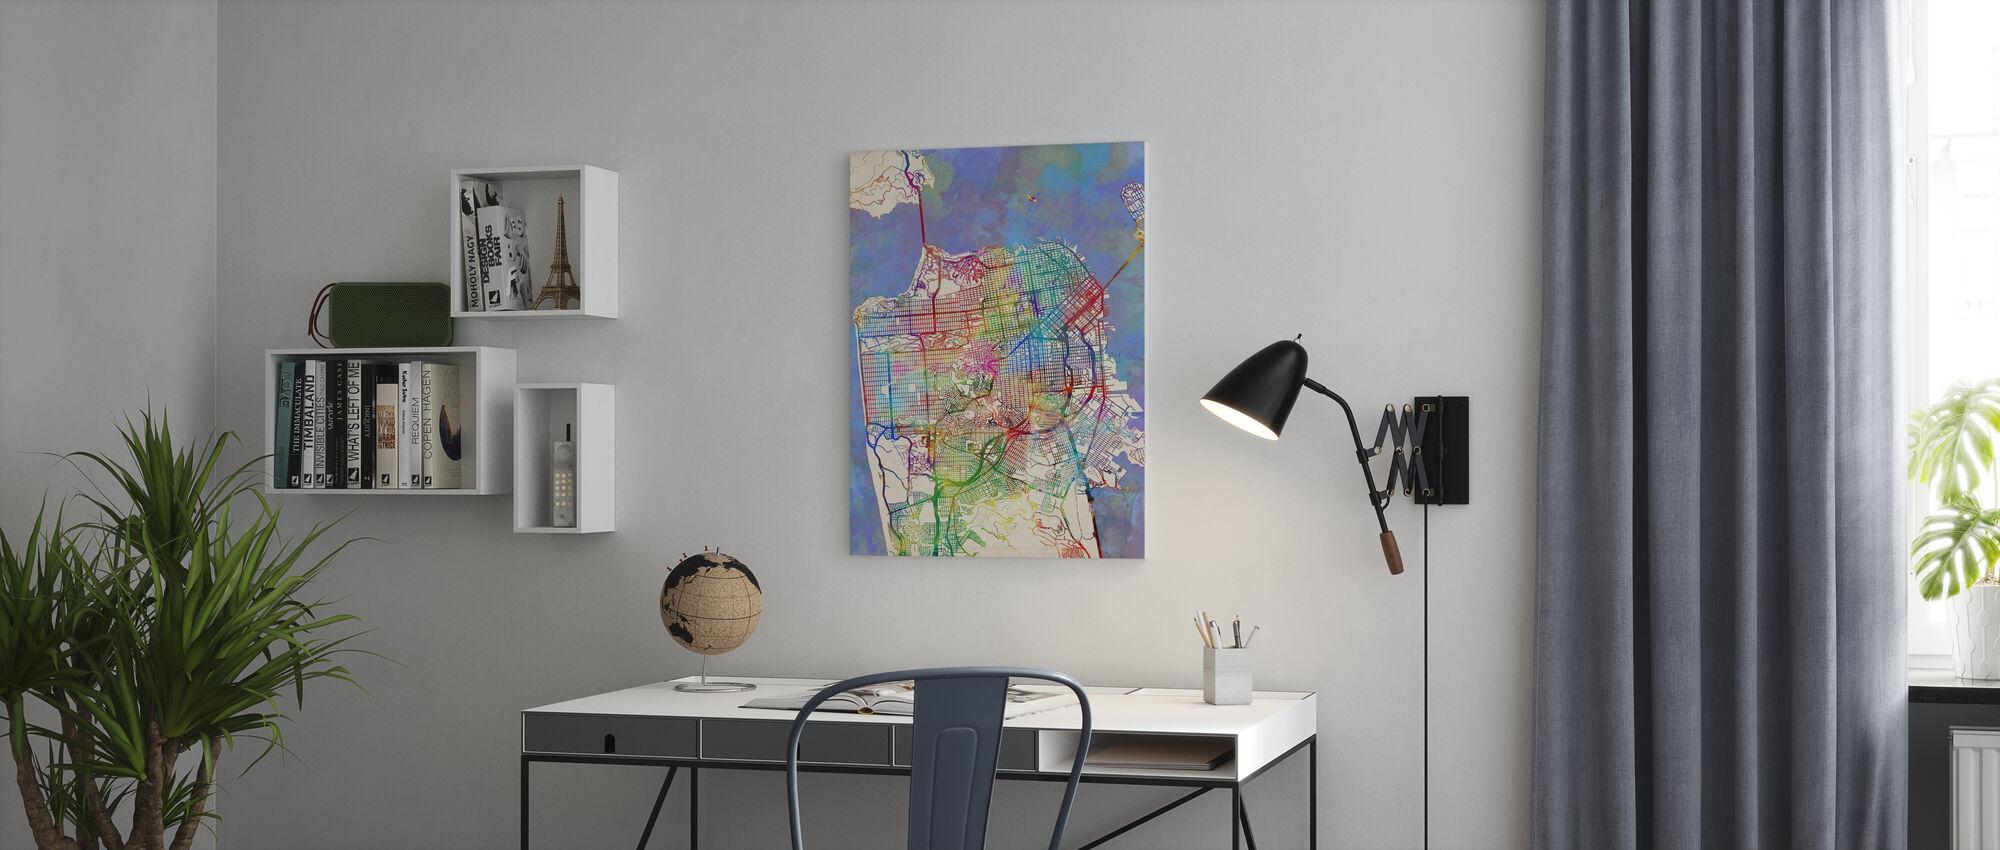 San Francisco City Street Map - Canvas print - Office